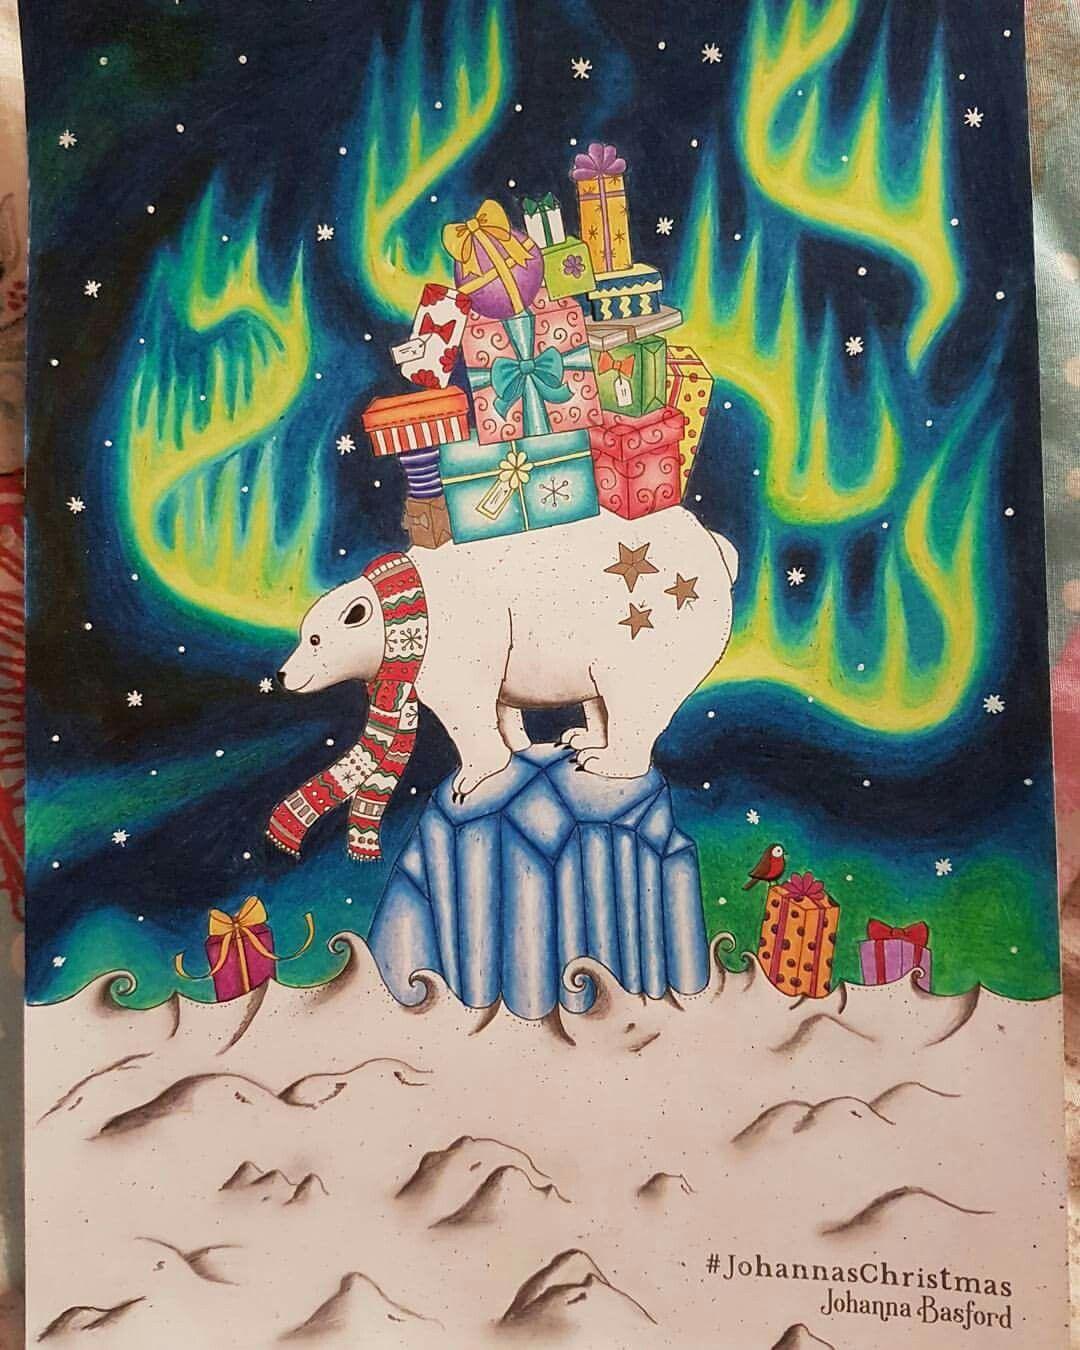 Johannas Christmas By Johanna Basford Using Prismacolor And Posca White Pen